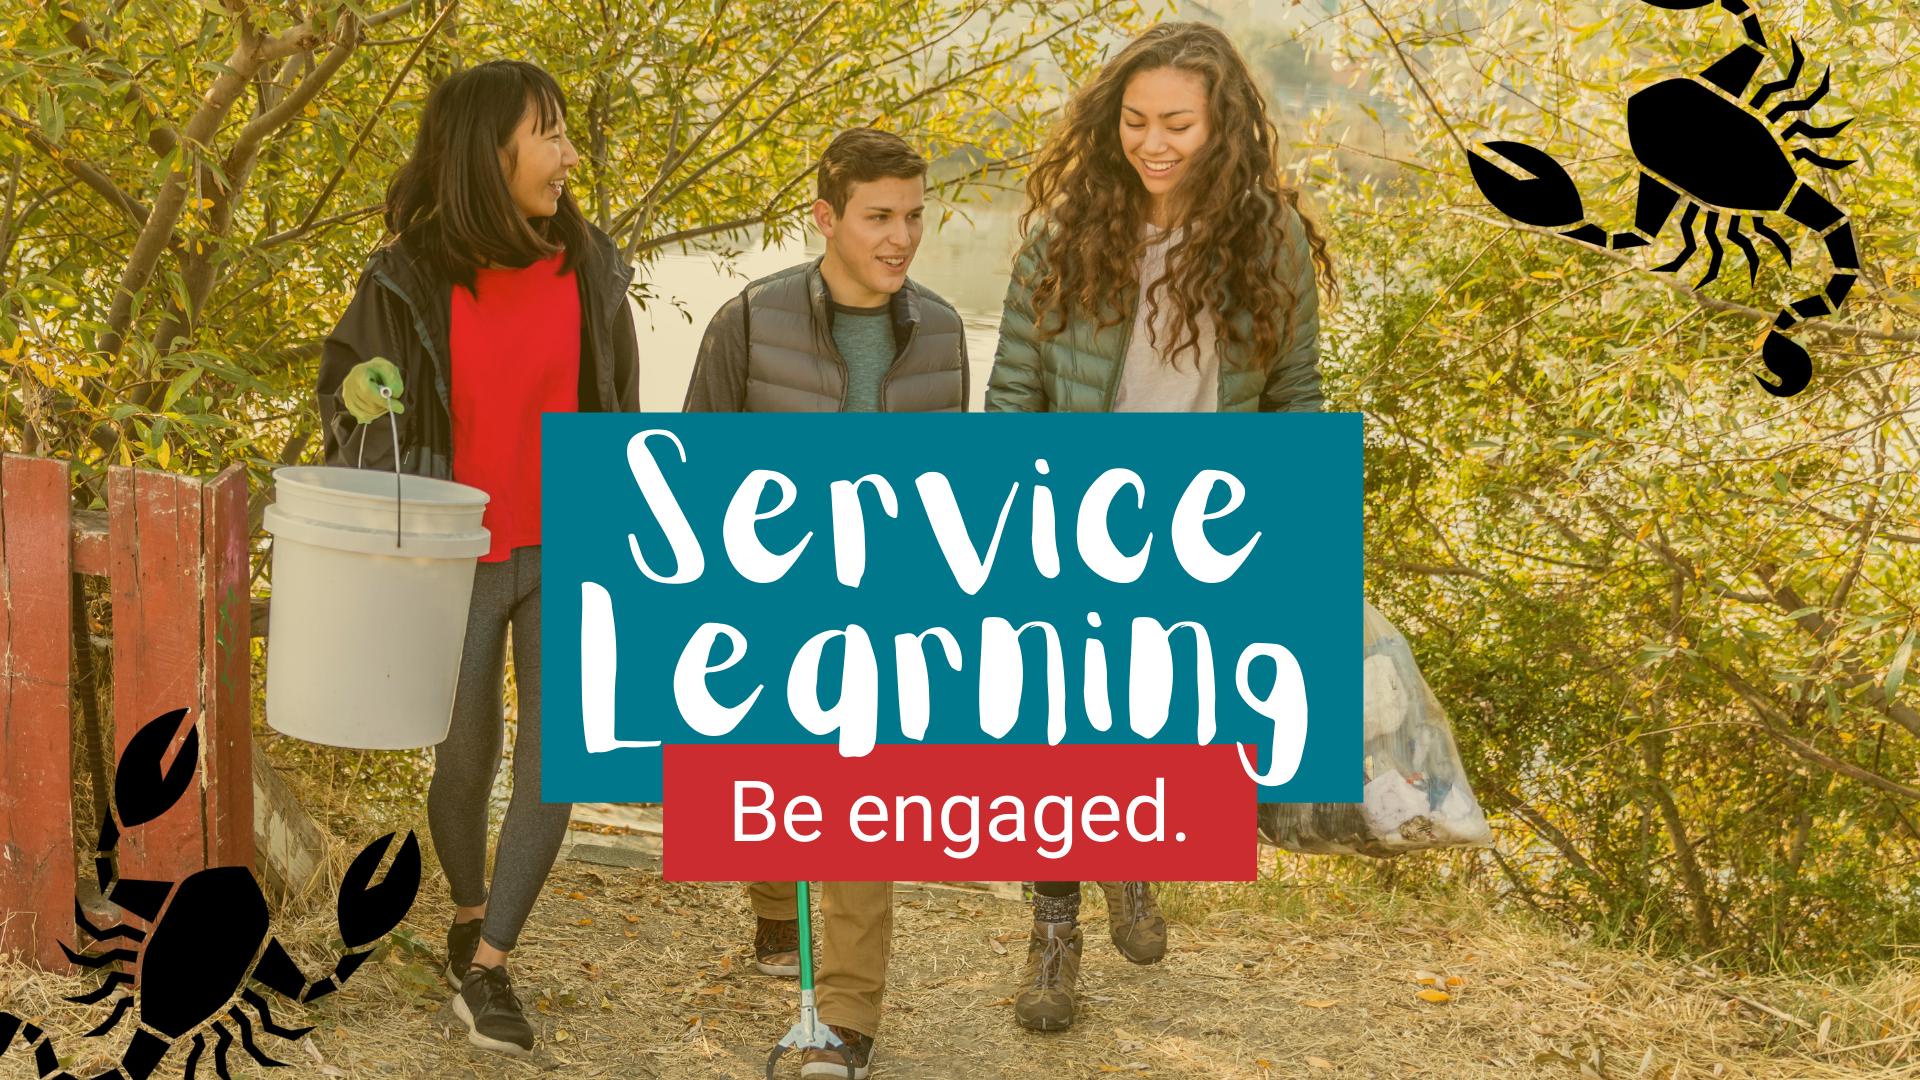 Service Learning Big Image